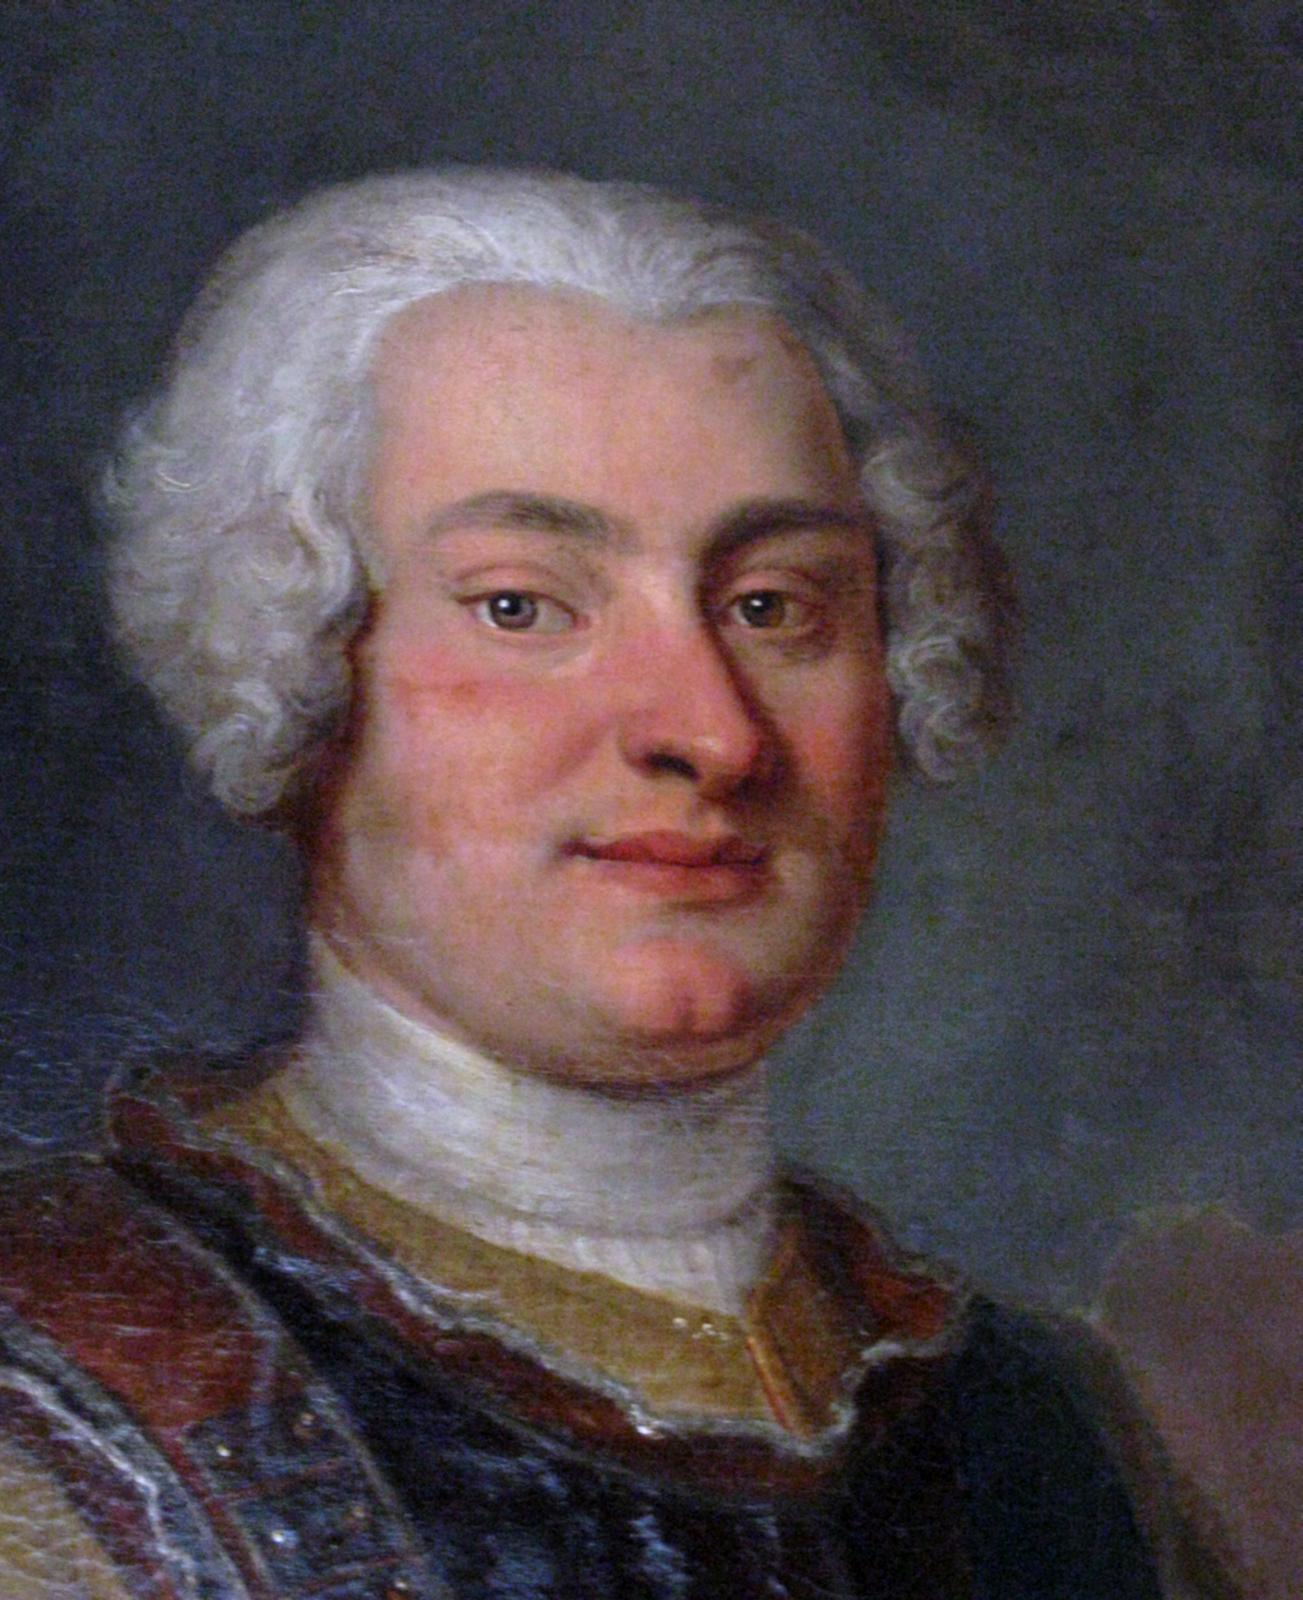 Fryderyk August Rutowski Źródło: Louis de Silvestre, Fryderyk August Rutowski, 1724, Maciej Szczepańczyk, licencja: CC BY-SA 3.0.